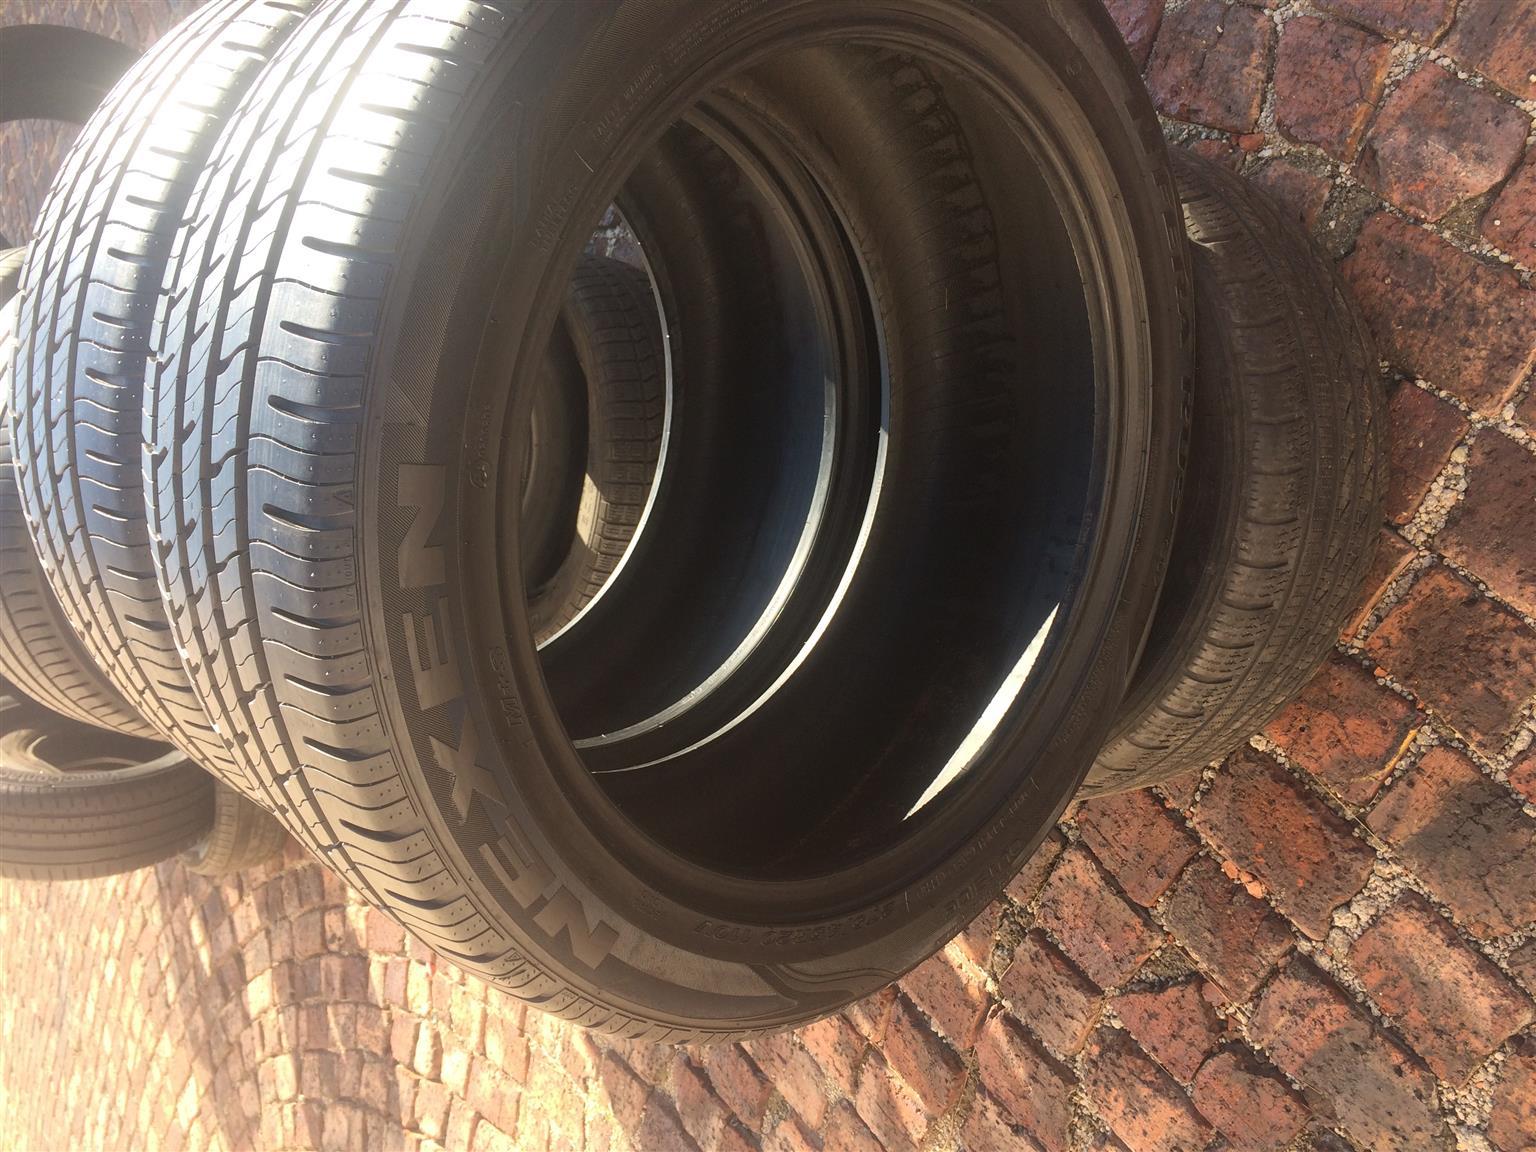 275/45/ r20 x 2 NEXEN Tyres. Like New.